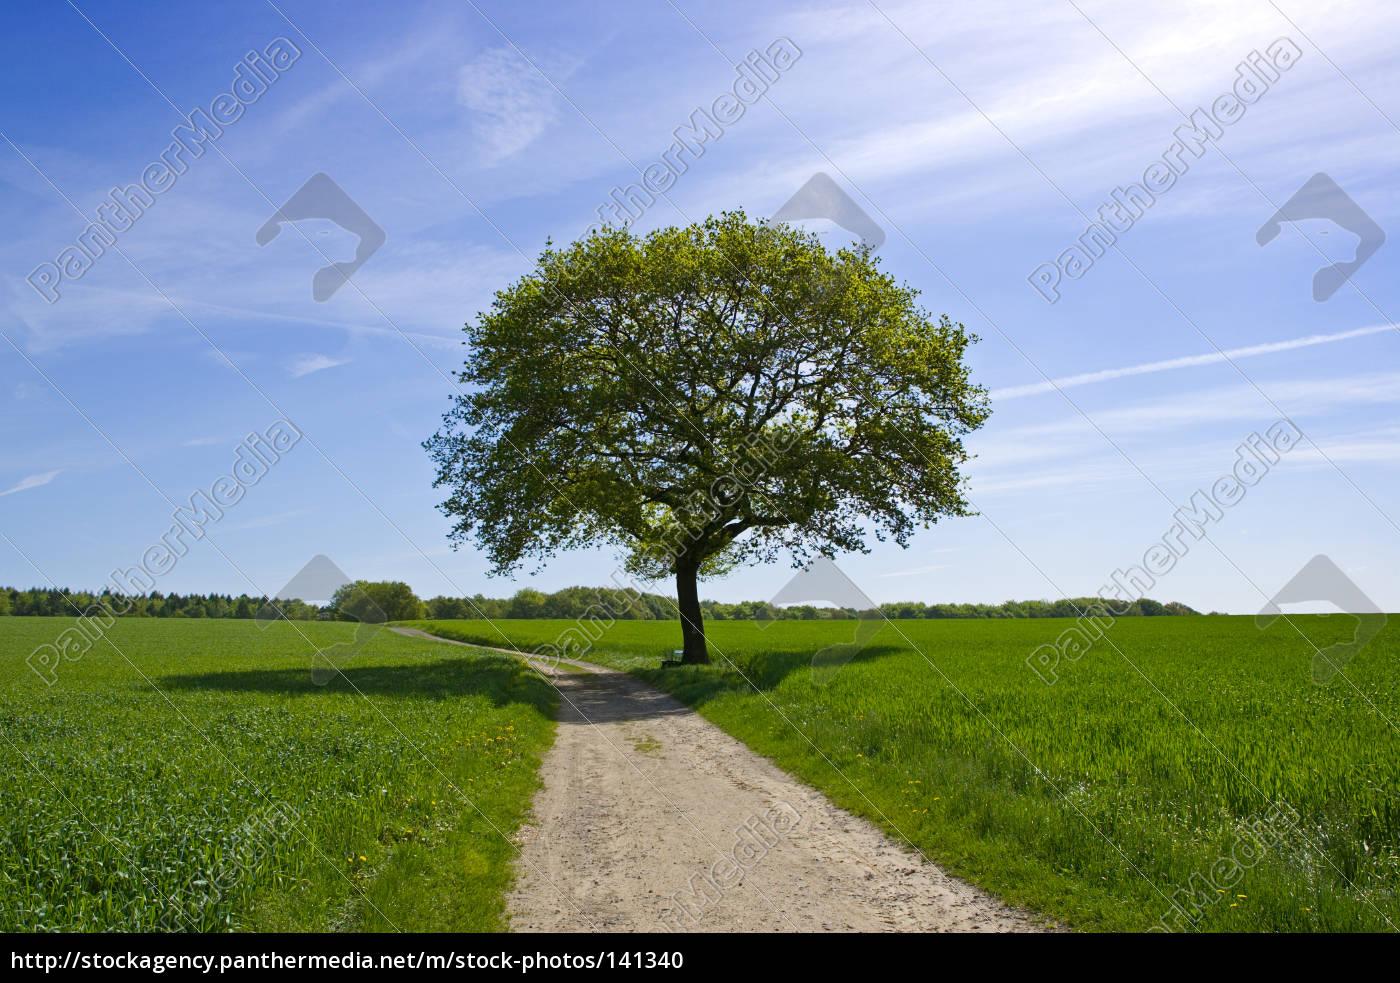 tree, on, the, way - 141340